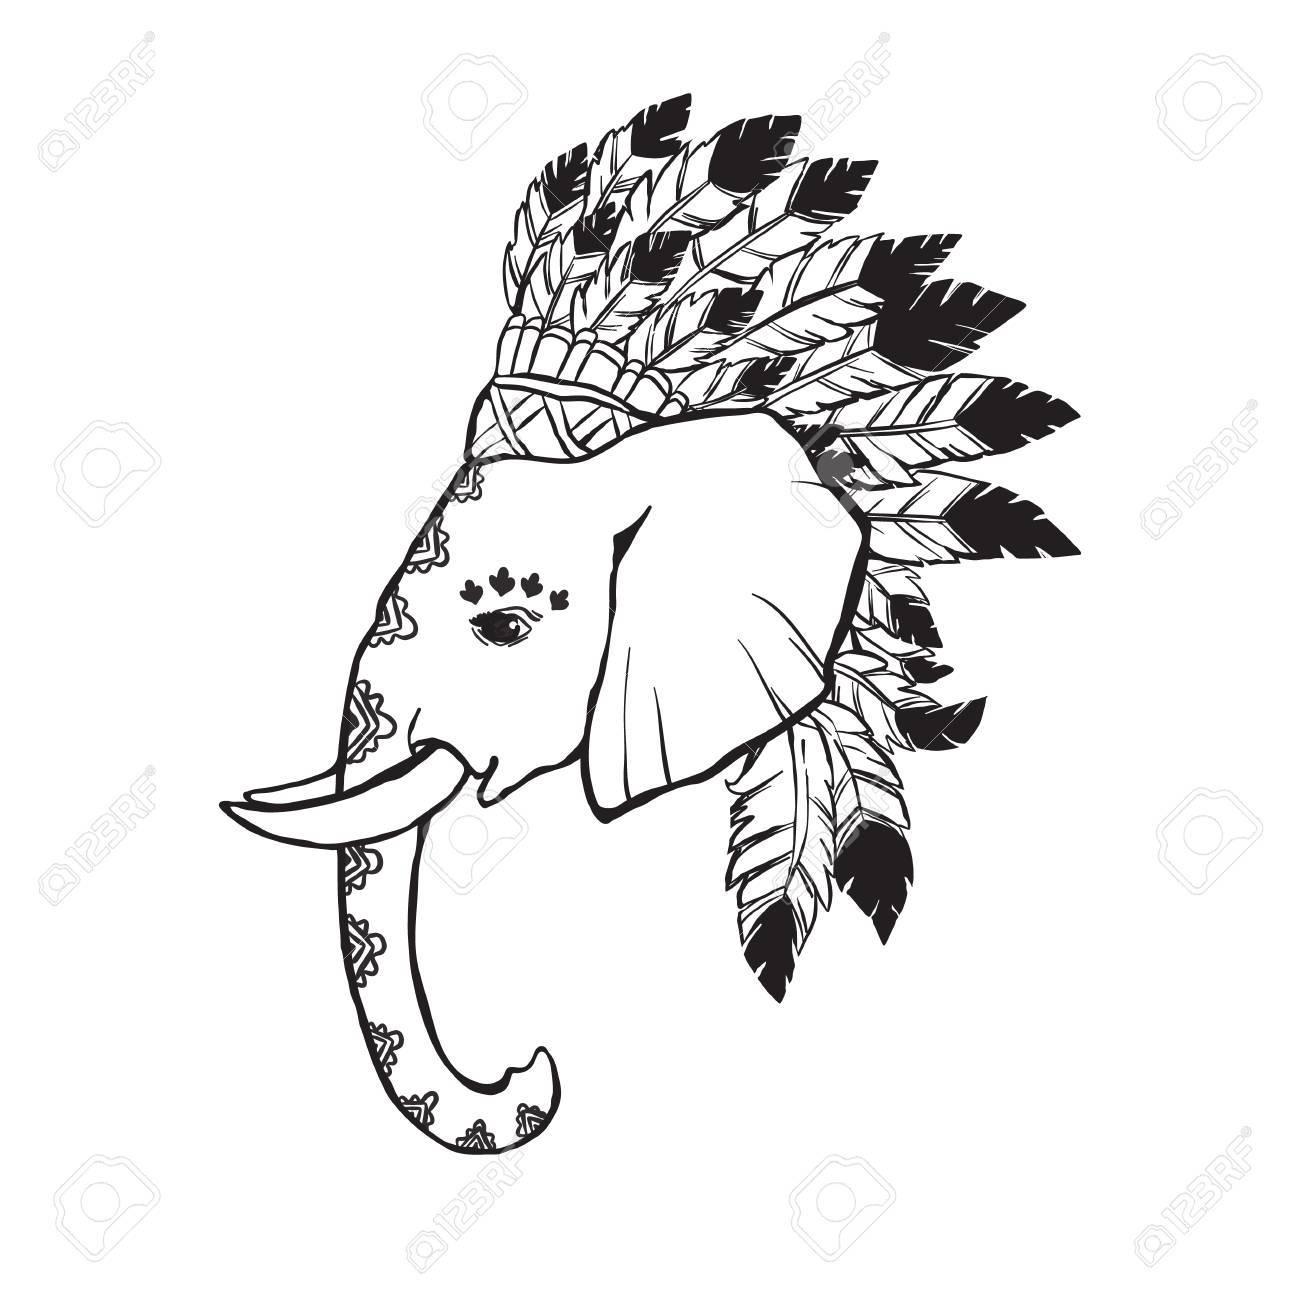 1300x1300 Elephant Head With American Indian Chief Headdress. Print